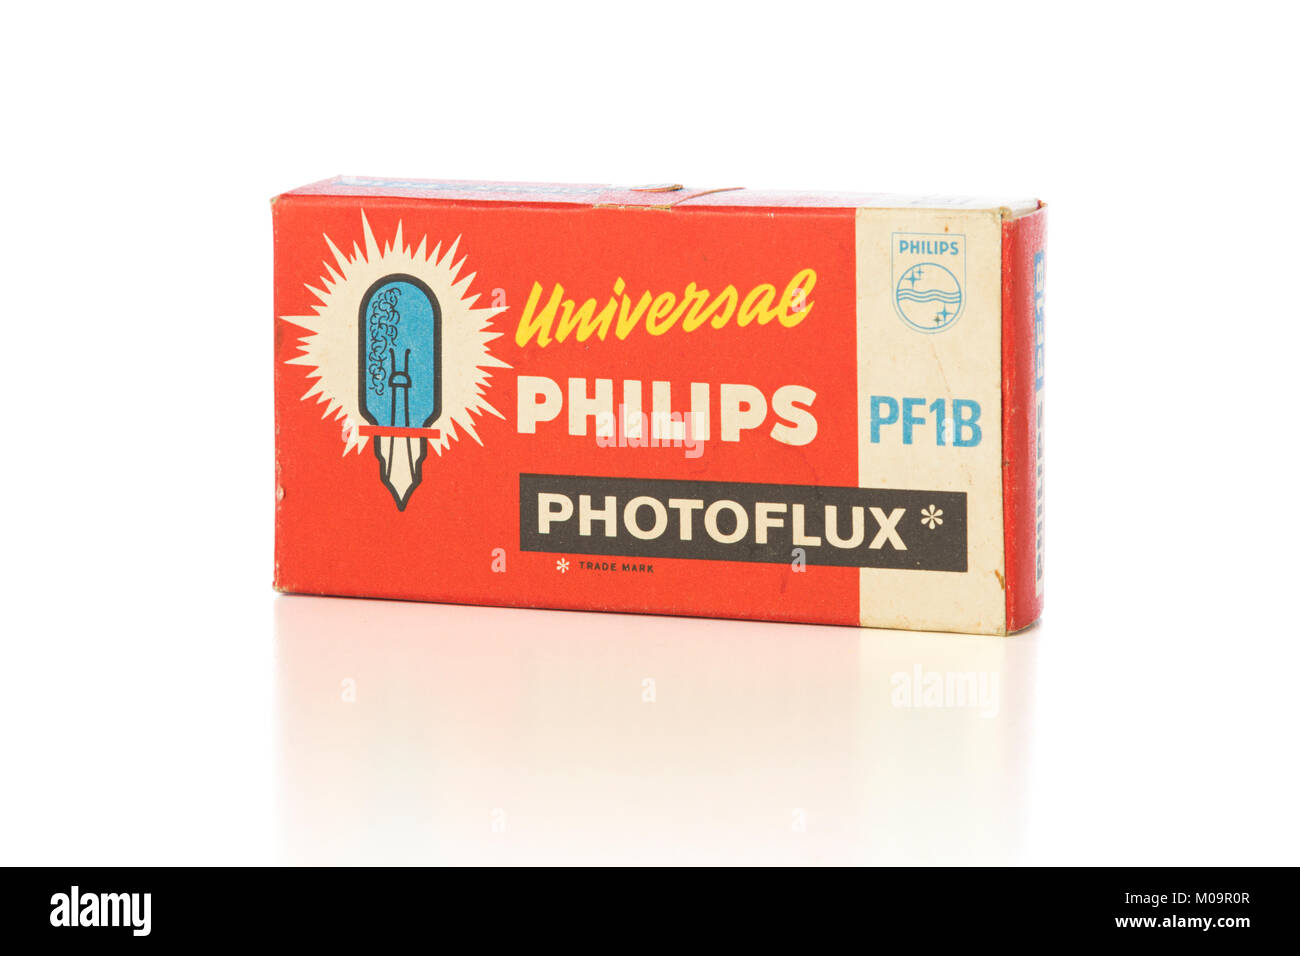 Studio shot of vintage Philips Photoflux flash bulb packaging on white background - Stock Image